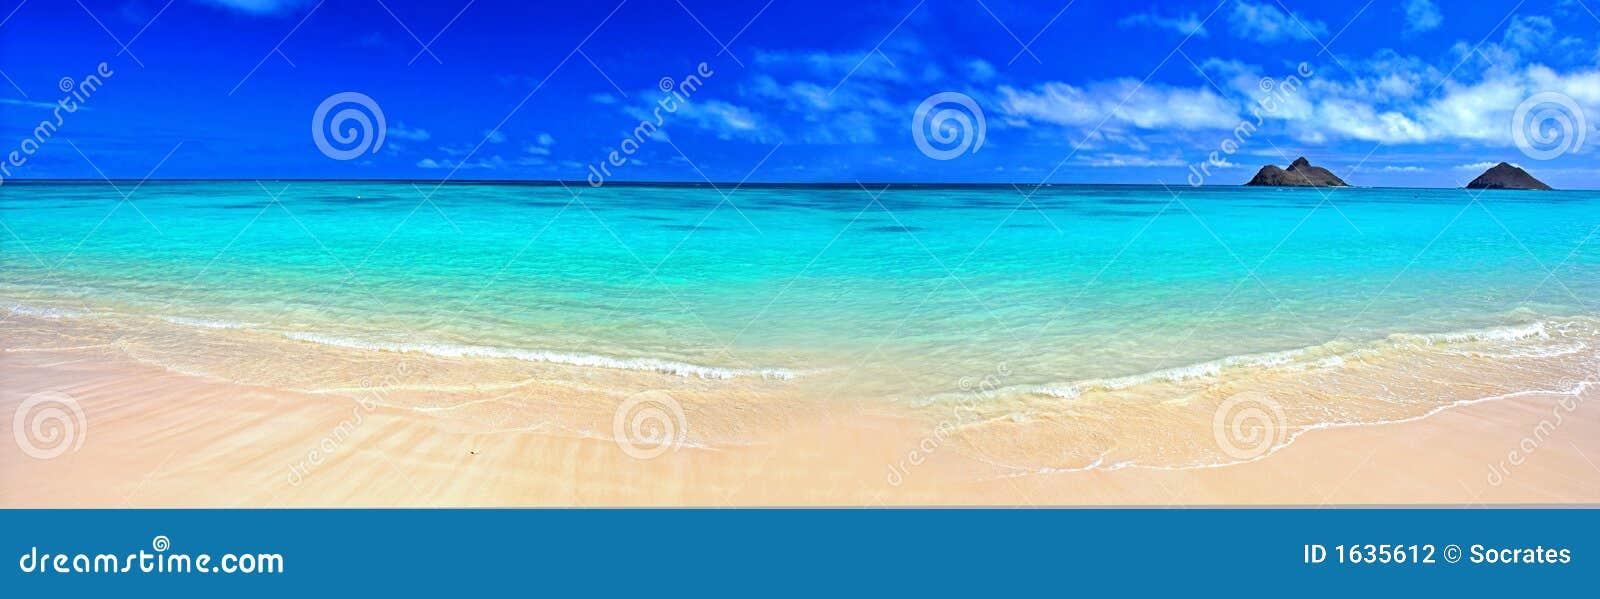 Praia ideal do panorama